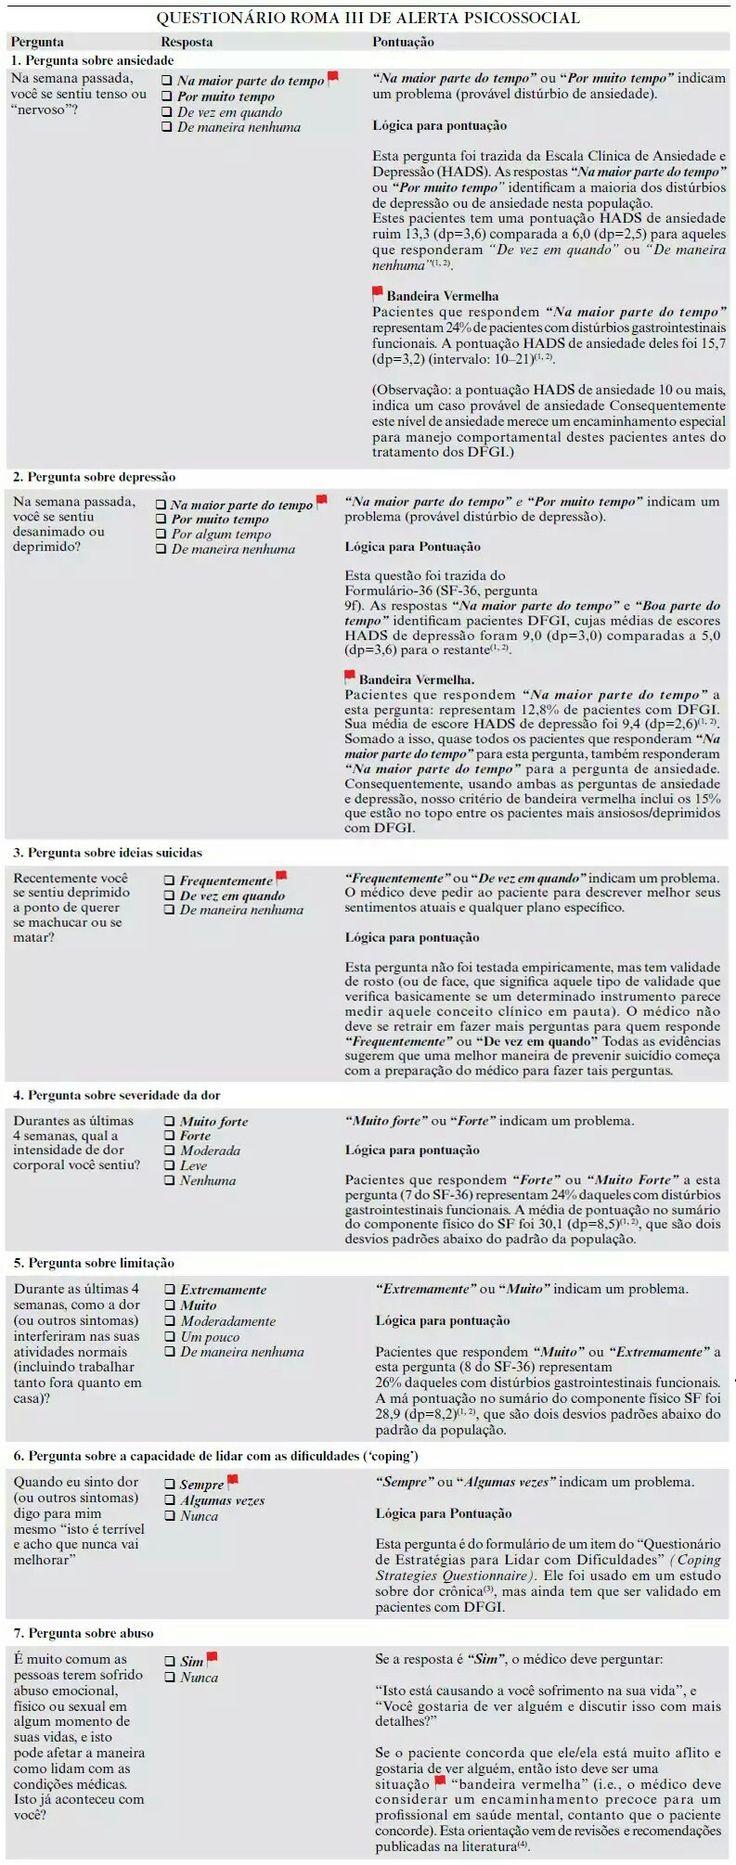 Roma III - Questionário psicossocial - http://www.scielo.br/scielo.php?script=sci_arttext&pid=S0004-28032012000500010